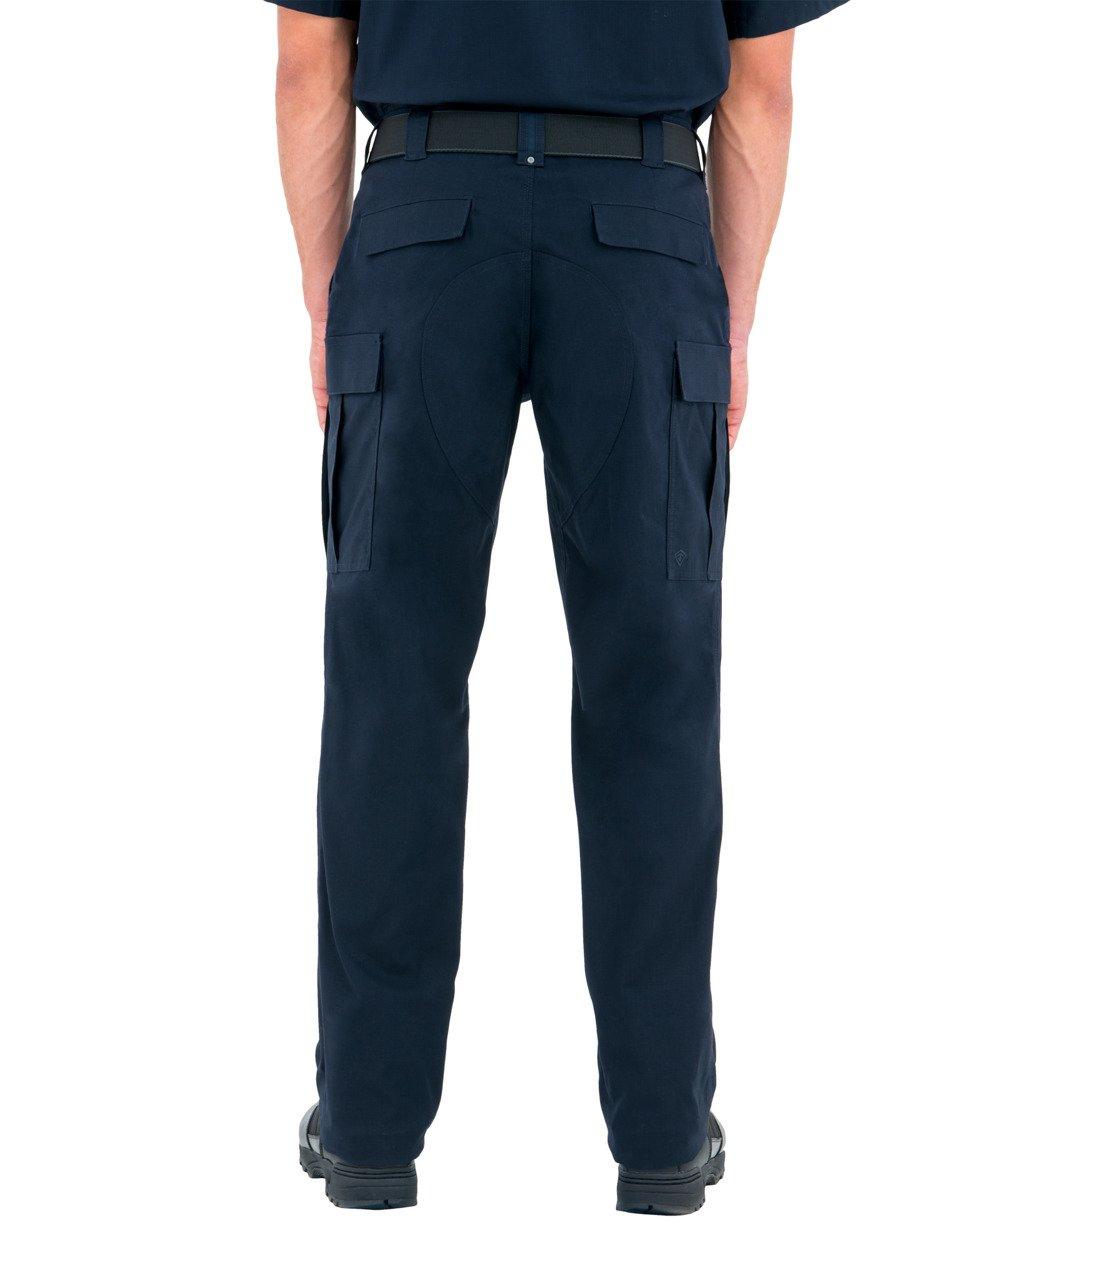 e204797fd1c8 MEN'S TACTIX BDU PANTS Dark Blue | Trekking \ Men´s clothing \ Pants casual  Military Surplus \ Used Clothing \ Pants \ Moleskin Pants Apparel \ Pants  ...